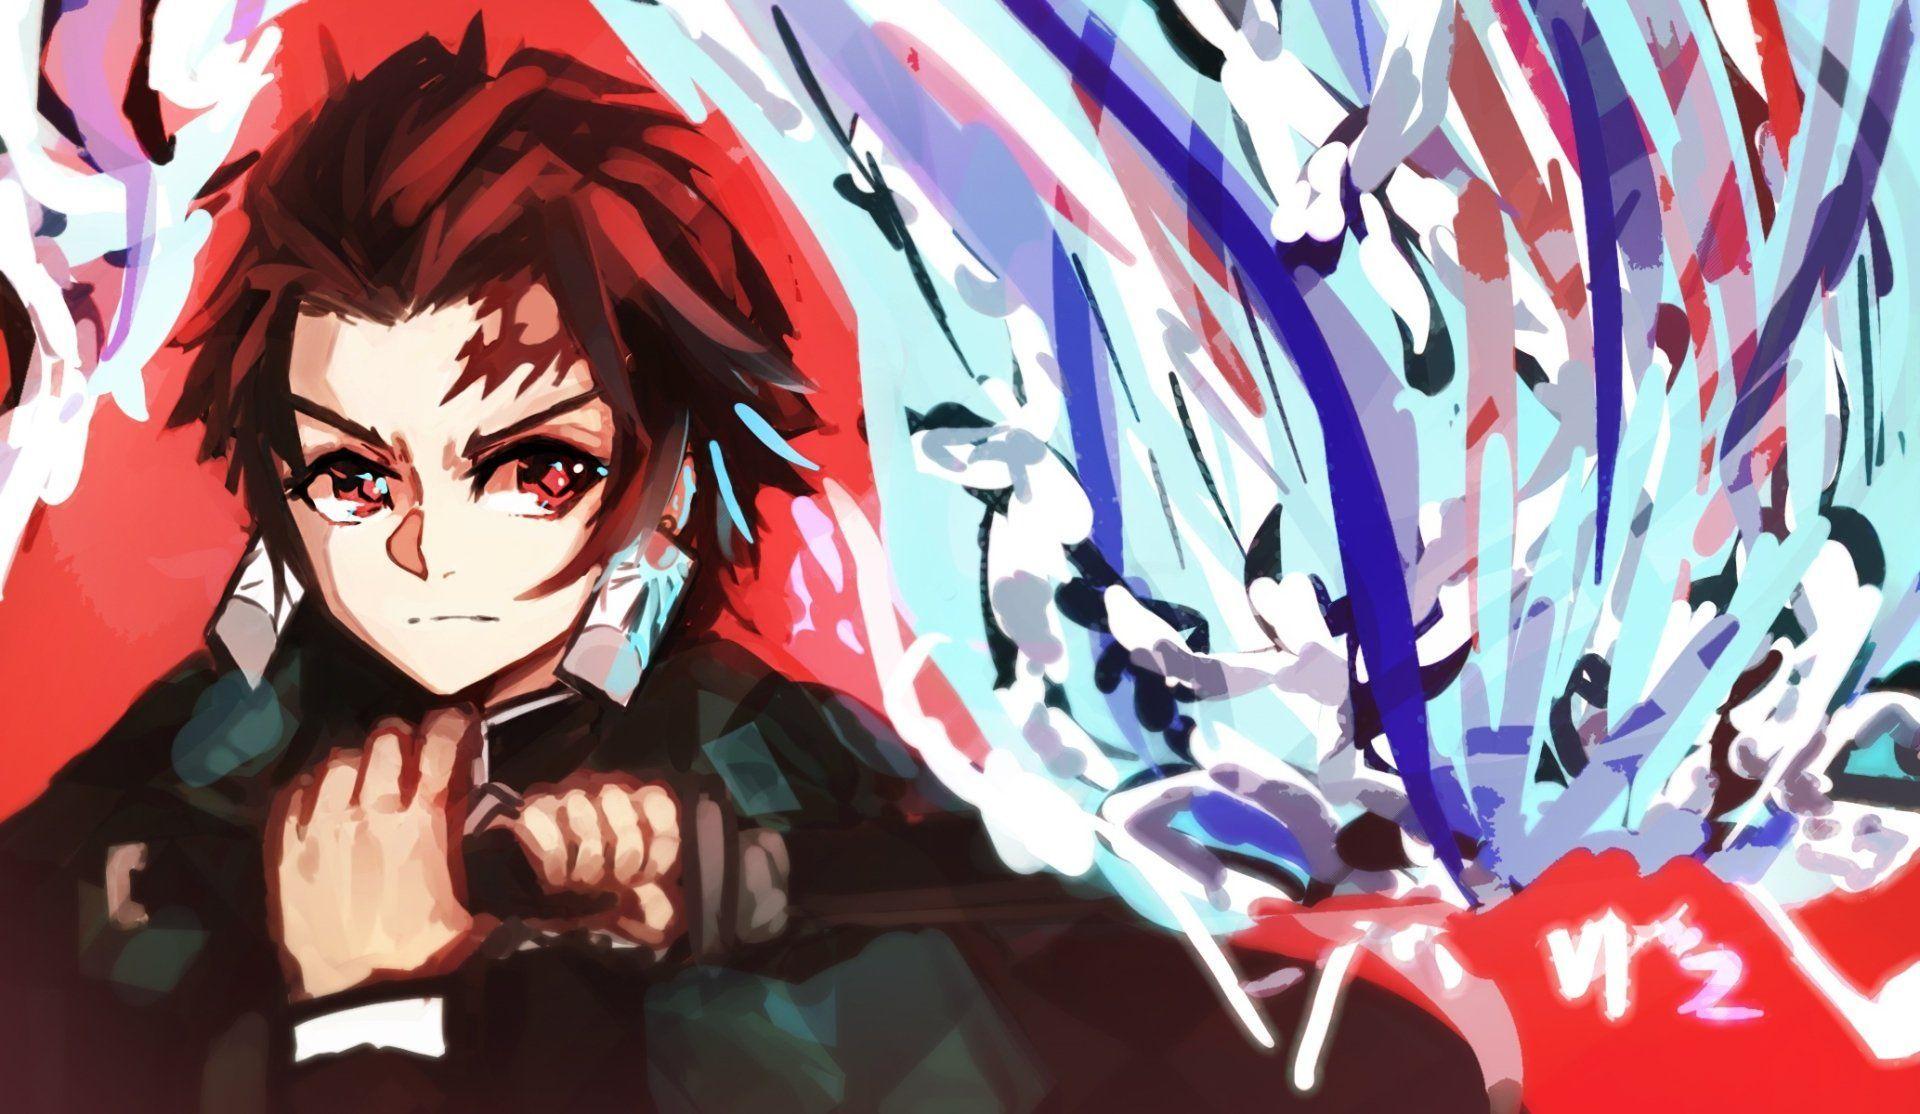 Demon Slayer Rykamall Anime Wallpaper Download Anime Wallpaper Anime Wallpaper Iphone